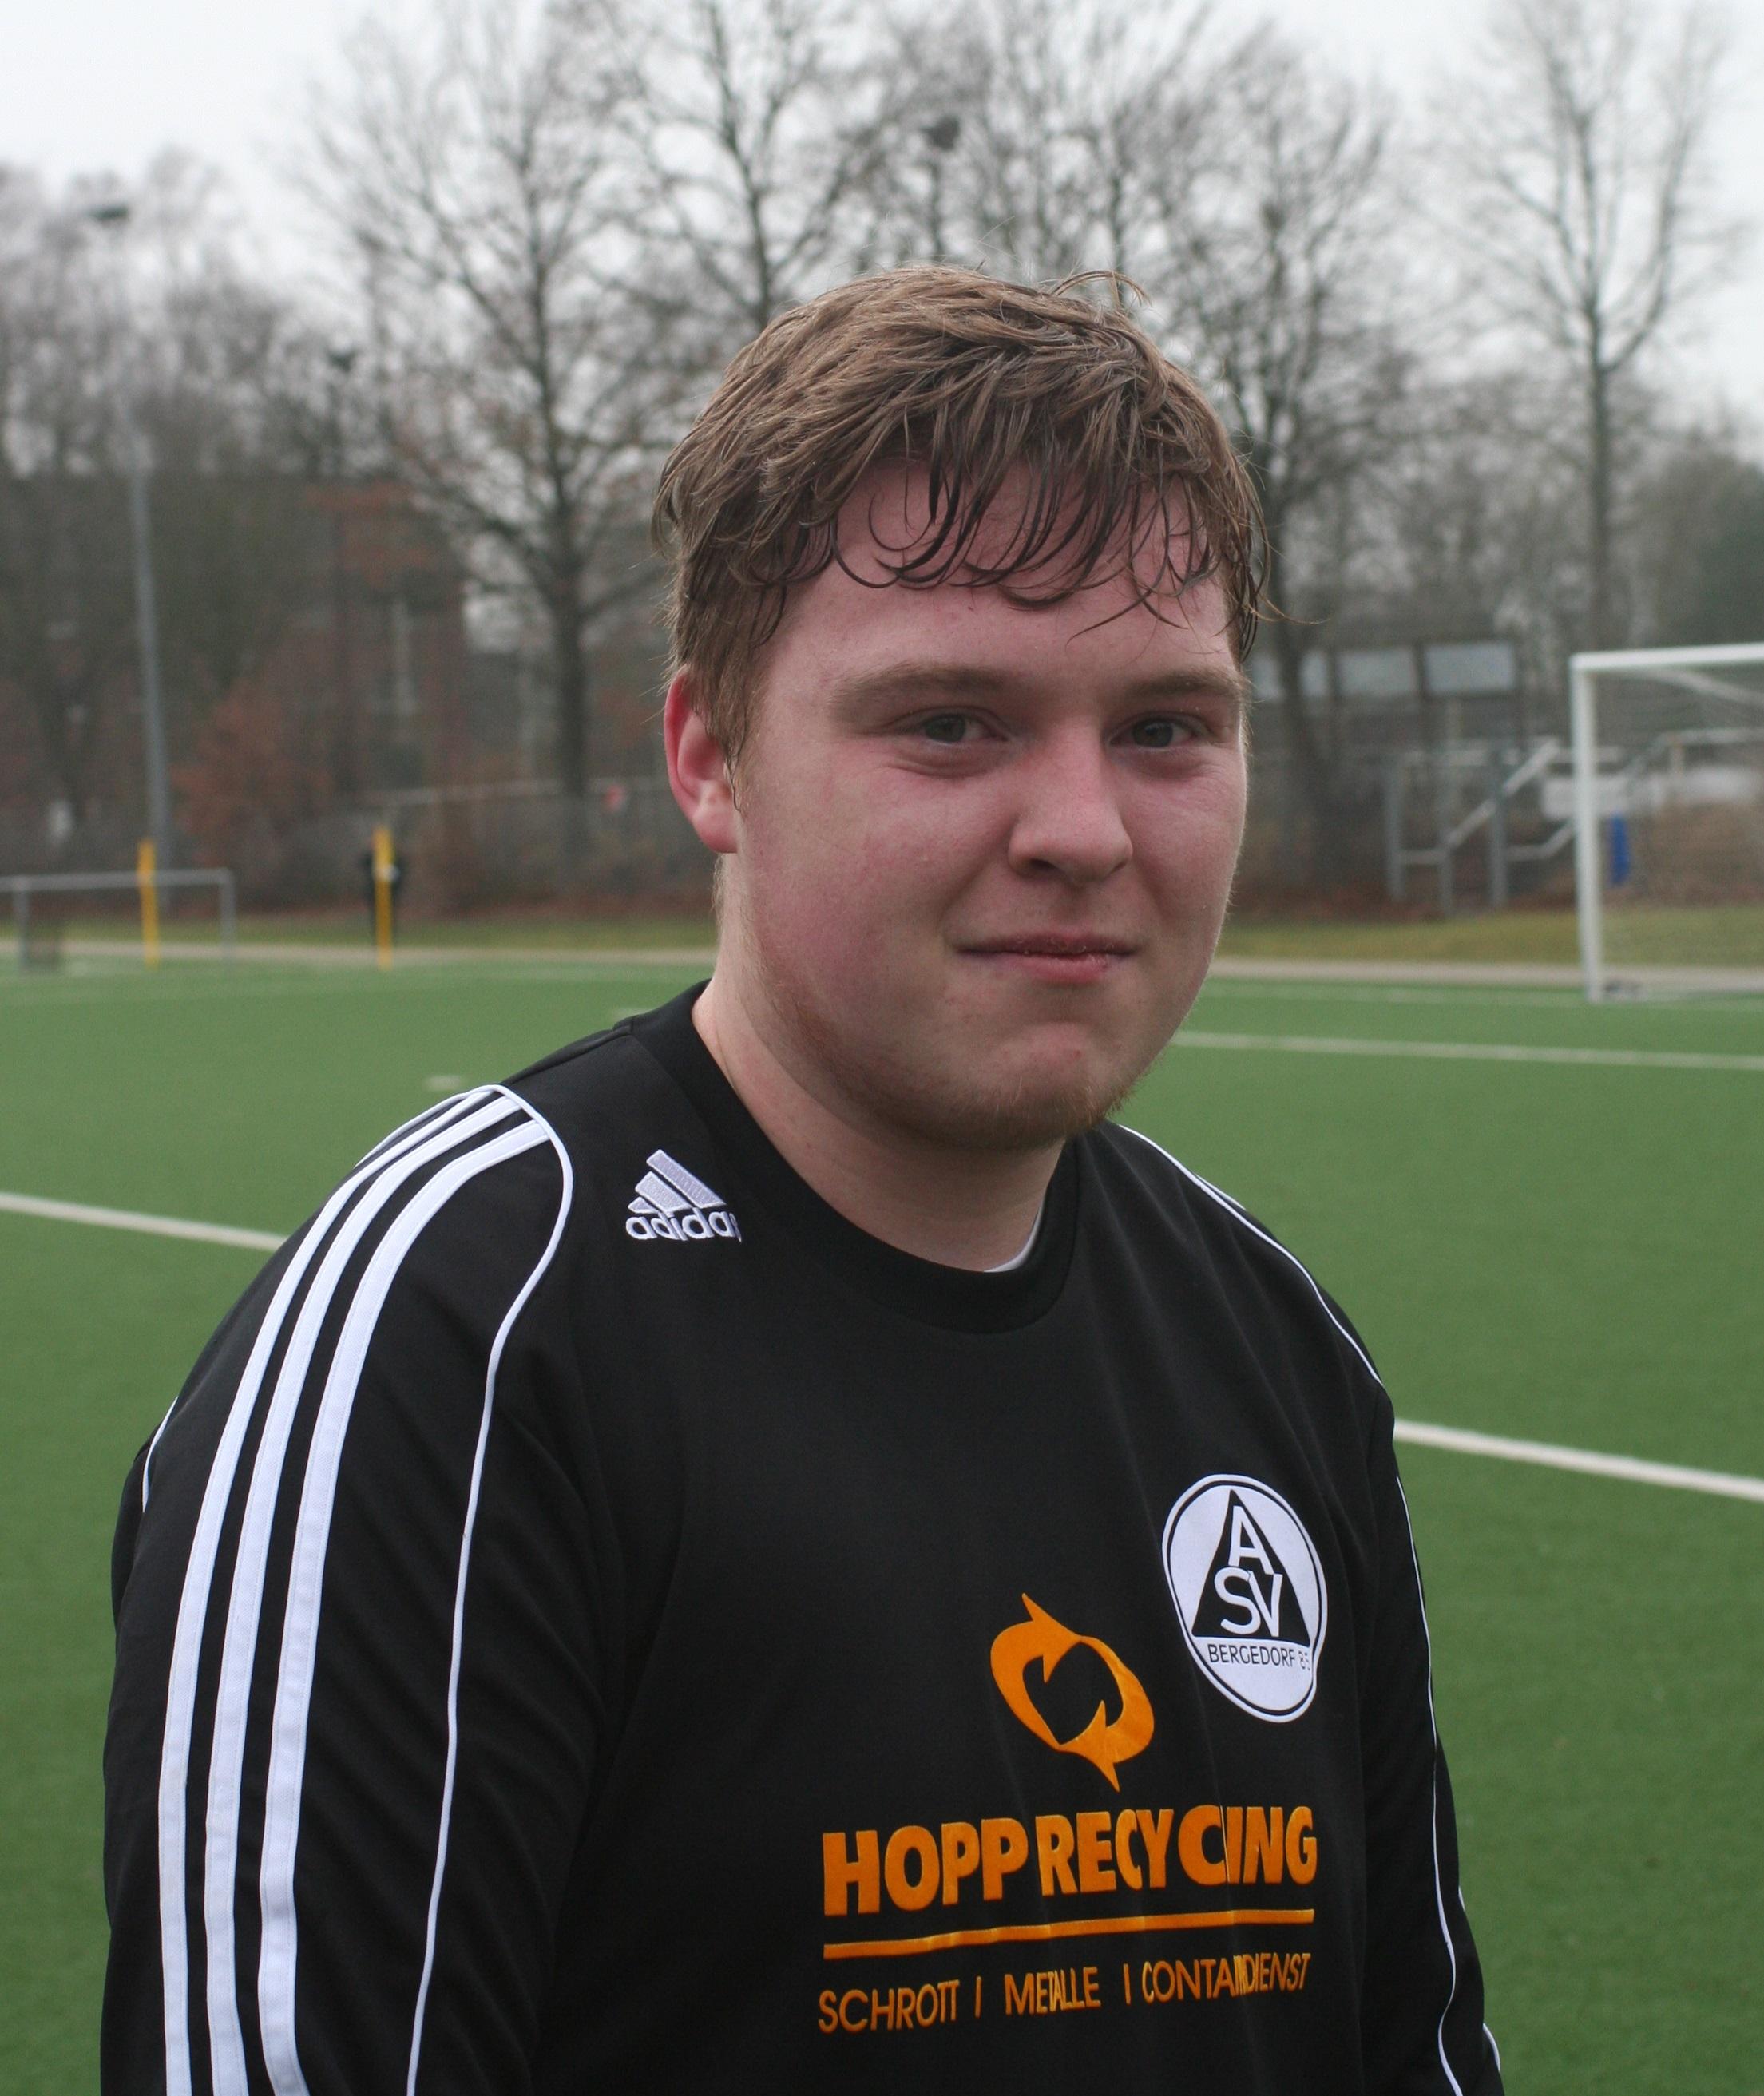 Spielerporträt Nico Witzke